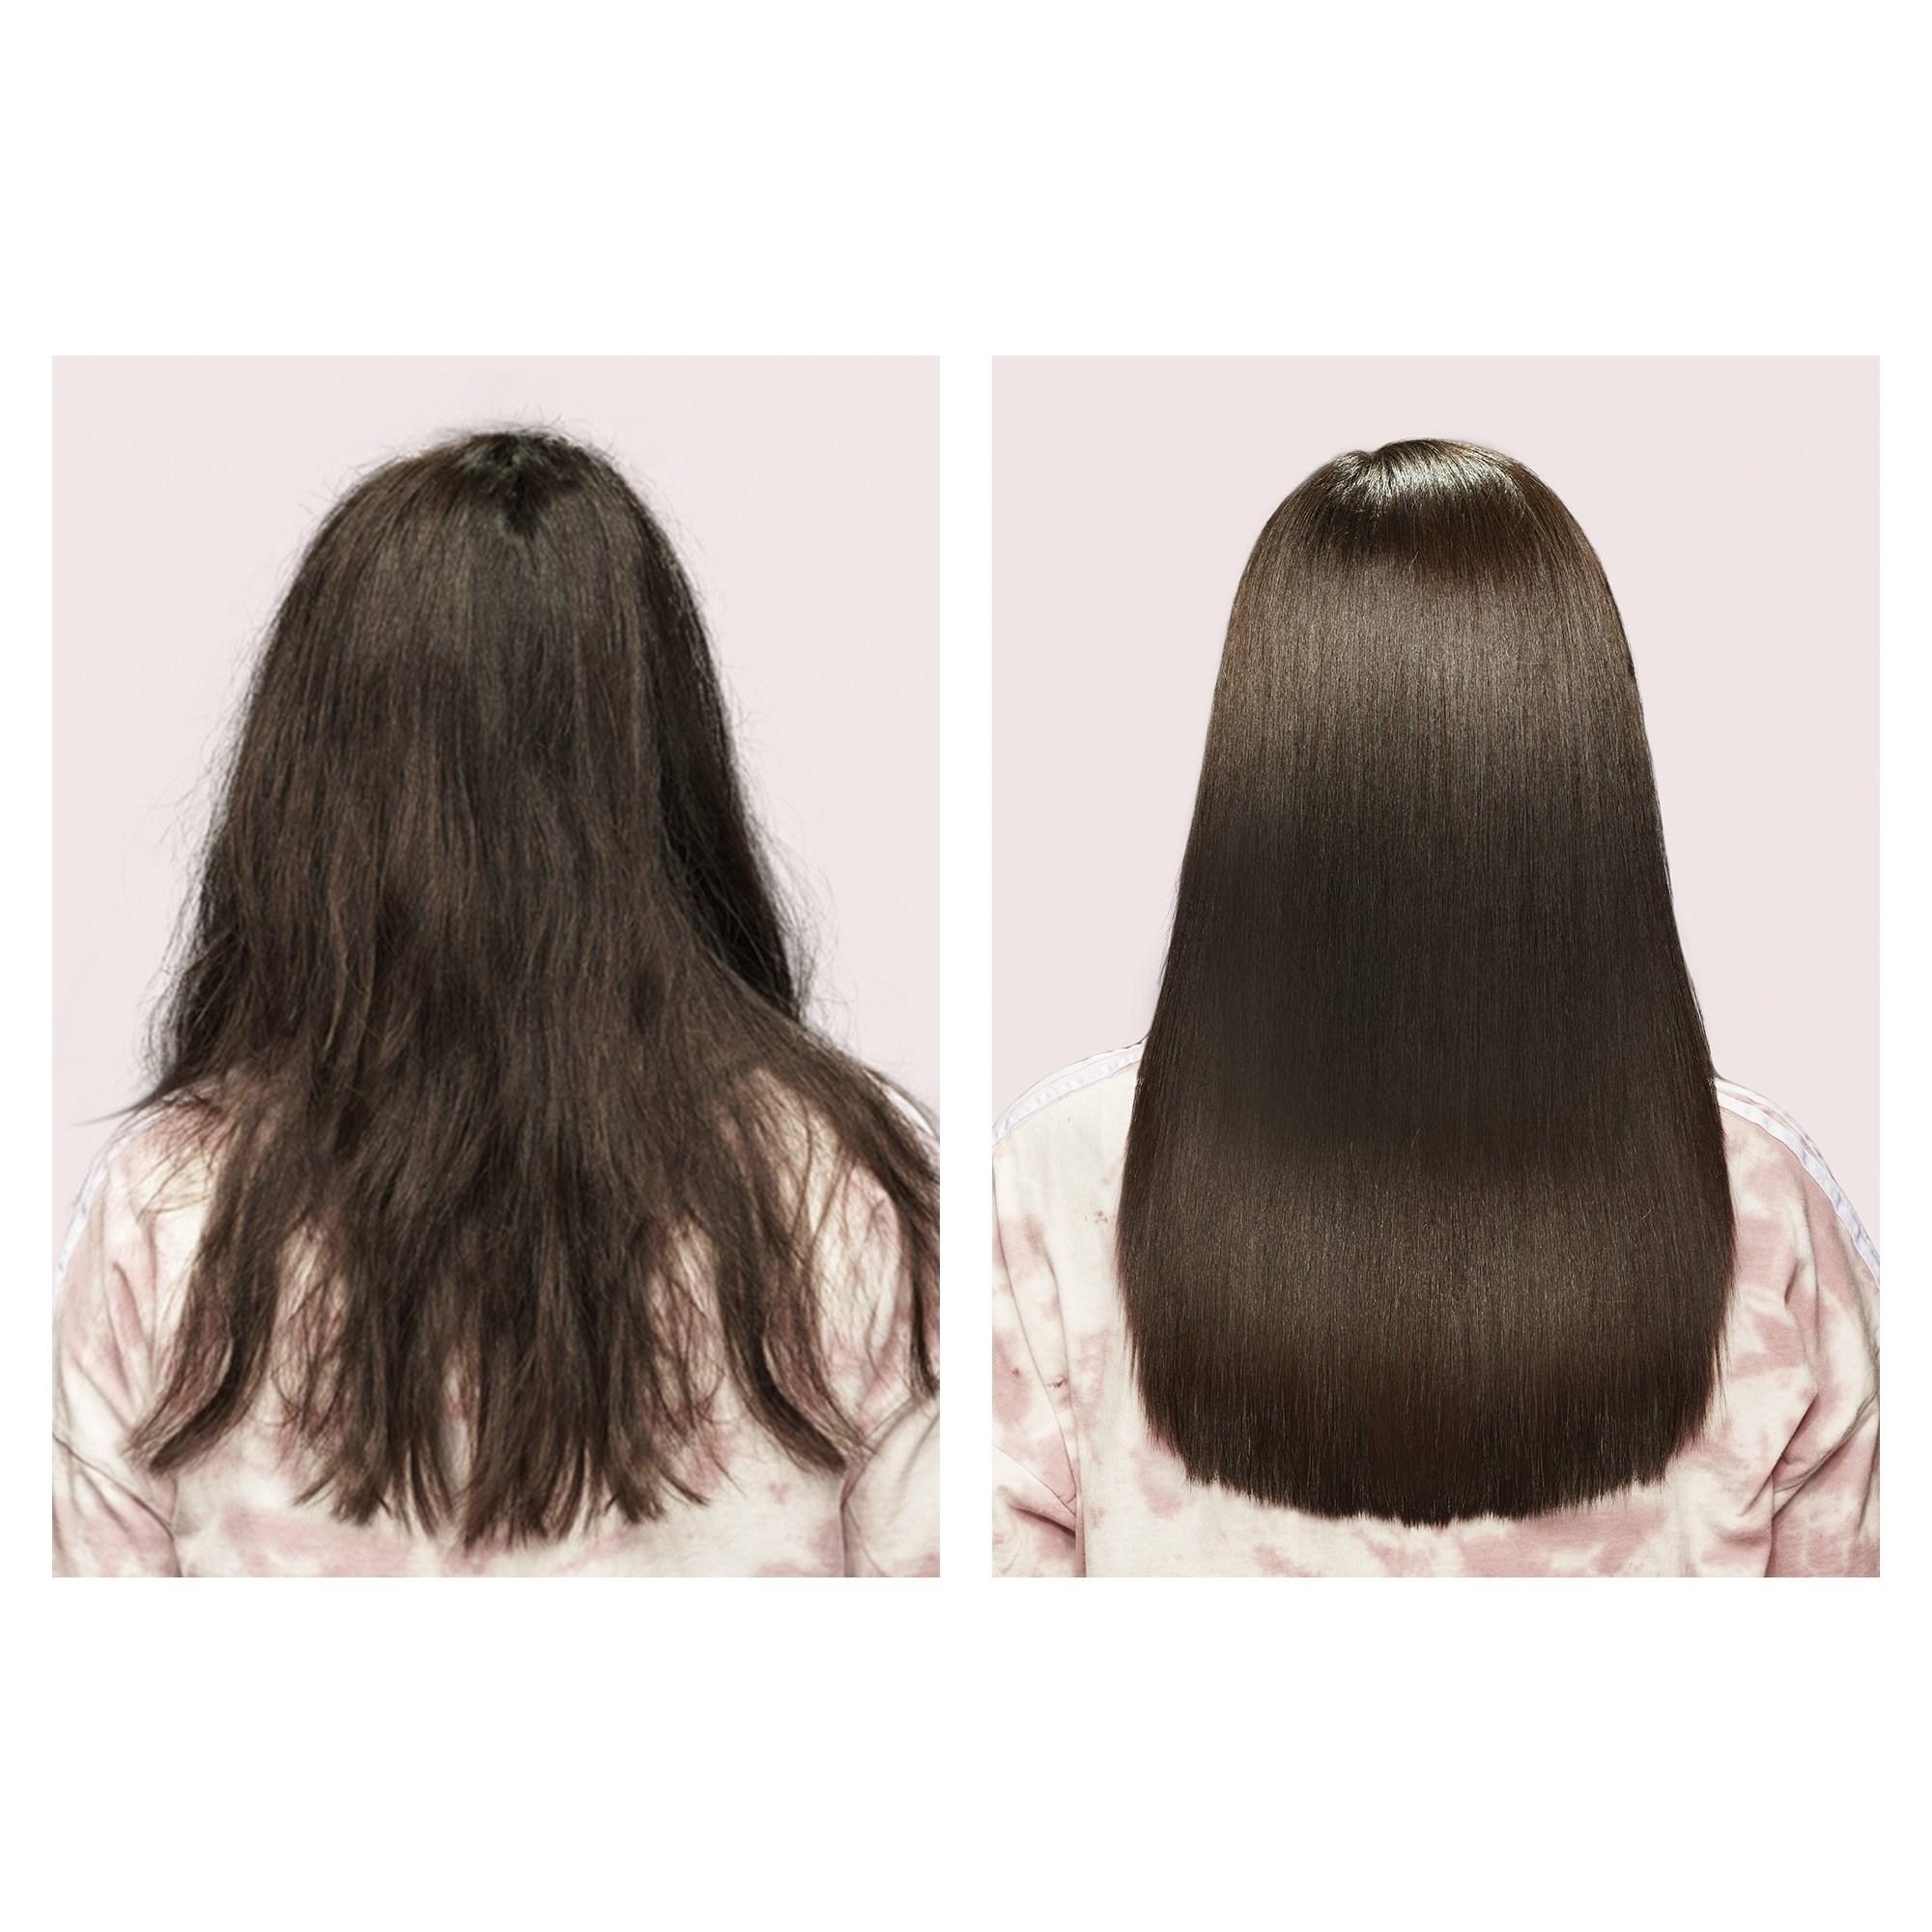 RESET YOUR HAIR KIT 3